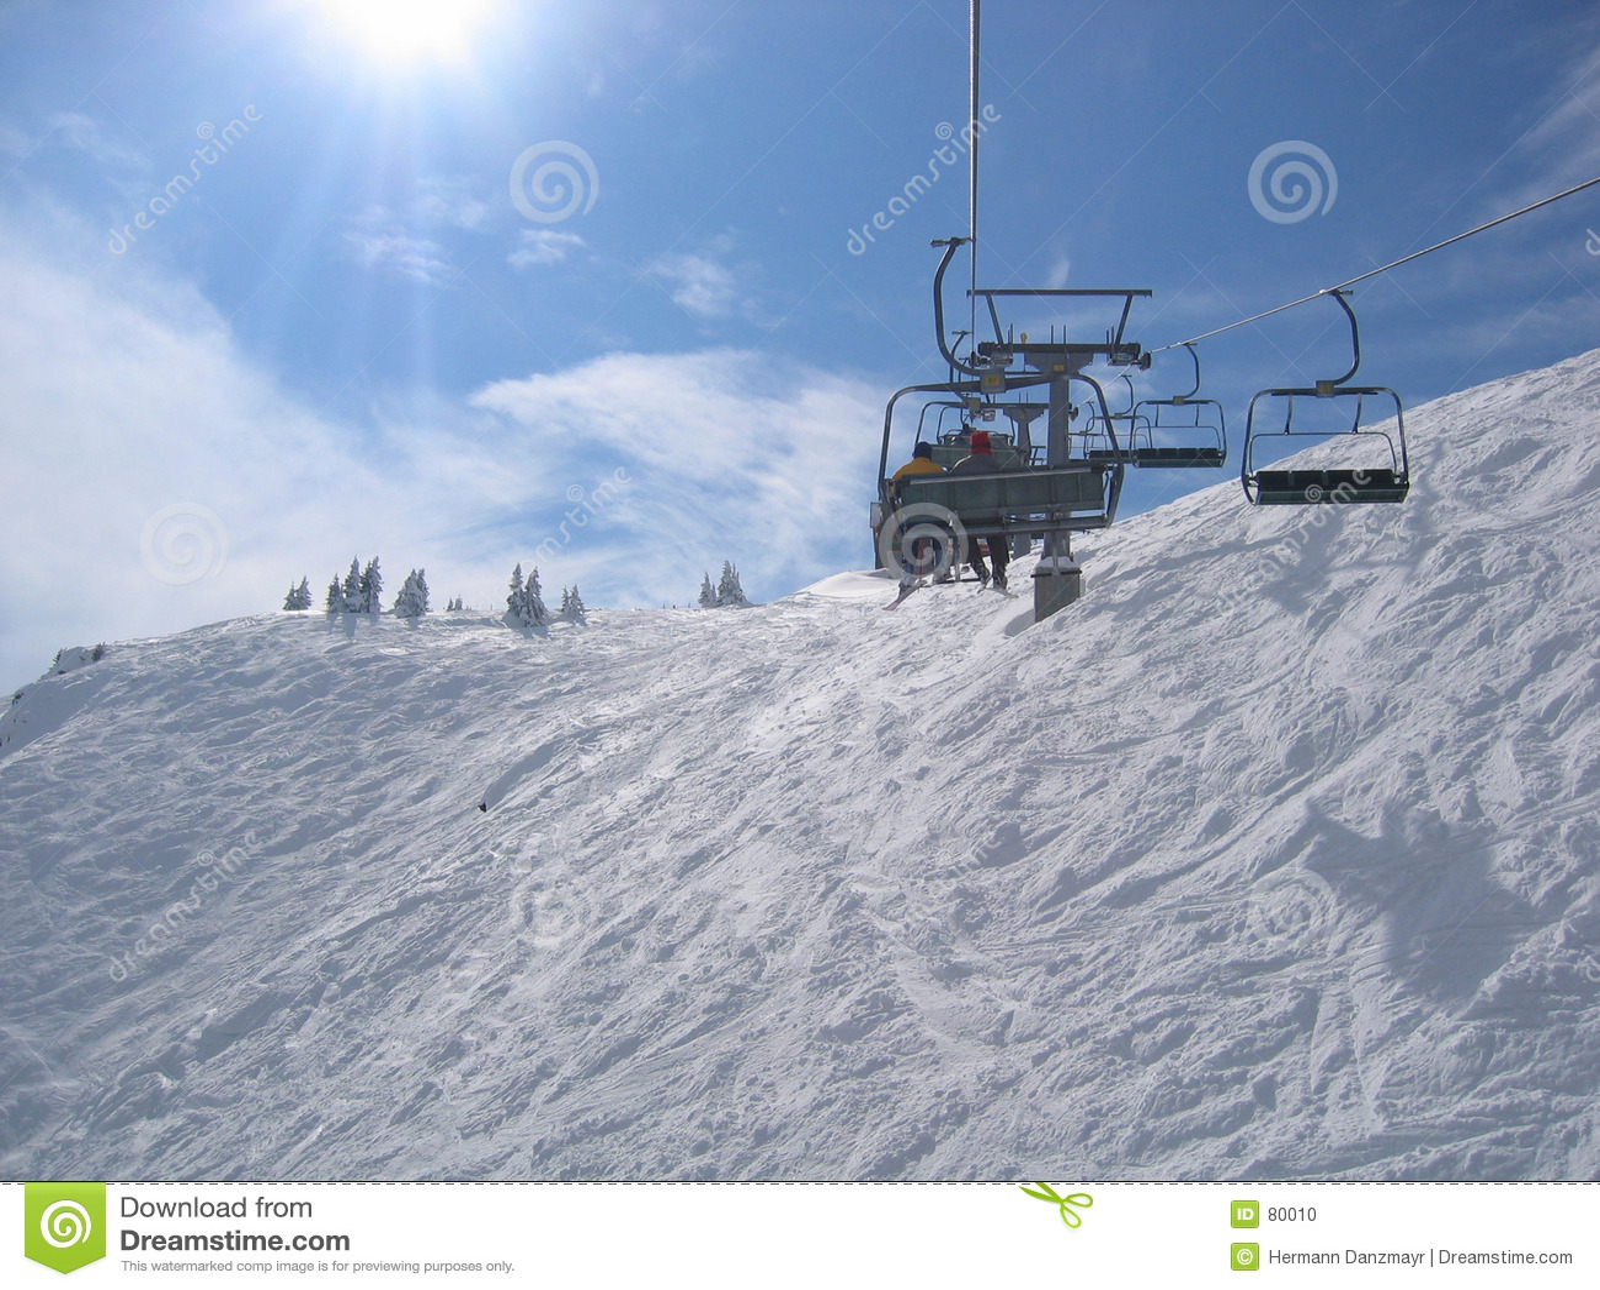 Austria obszaru na narty